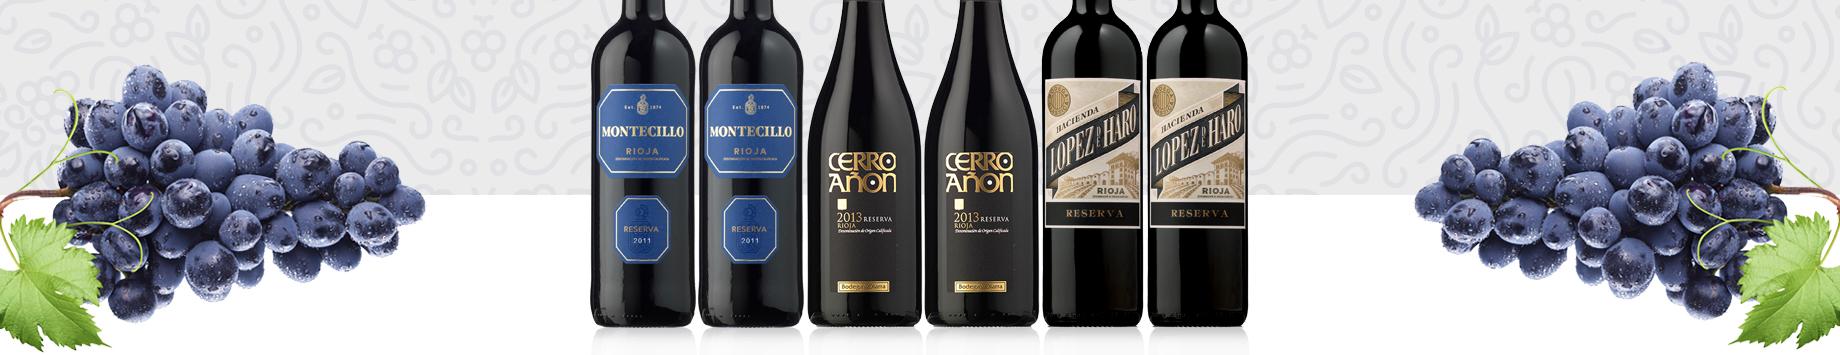 Colección Vinos Rioja